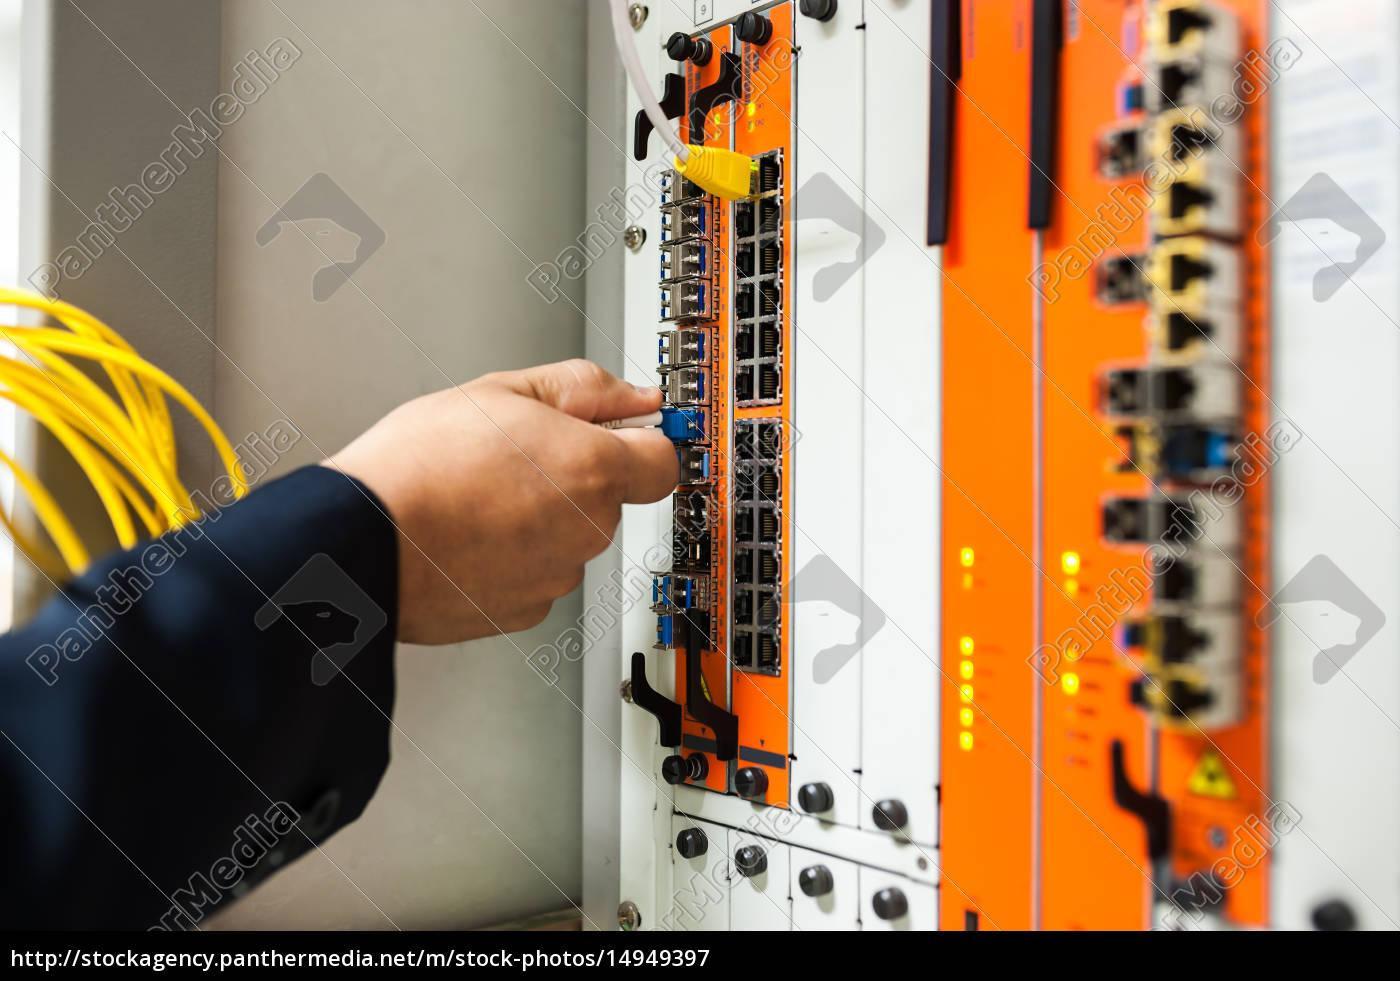 fix, network, switch, in, data, center - 14949397